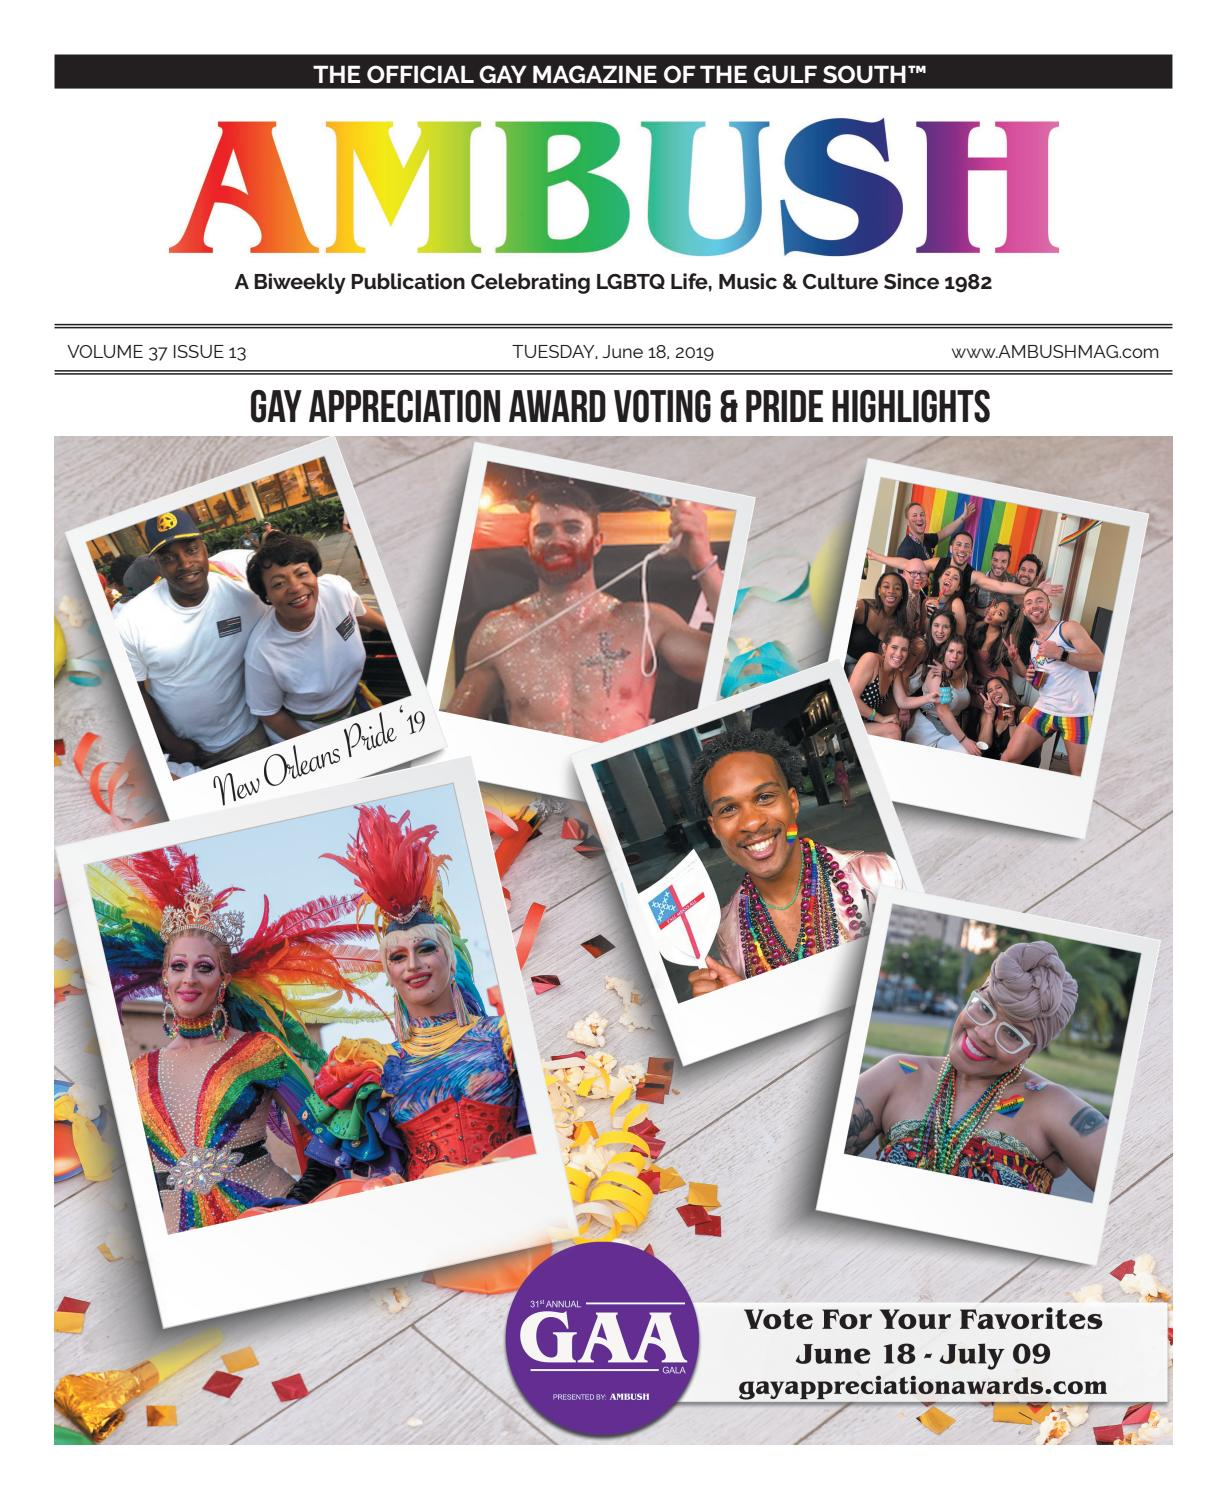 Ambush Magazine Volume 37 Issue 13 by Ambush Publishing - issuu